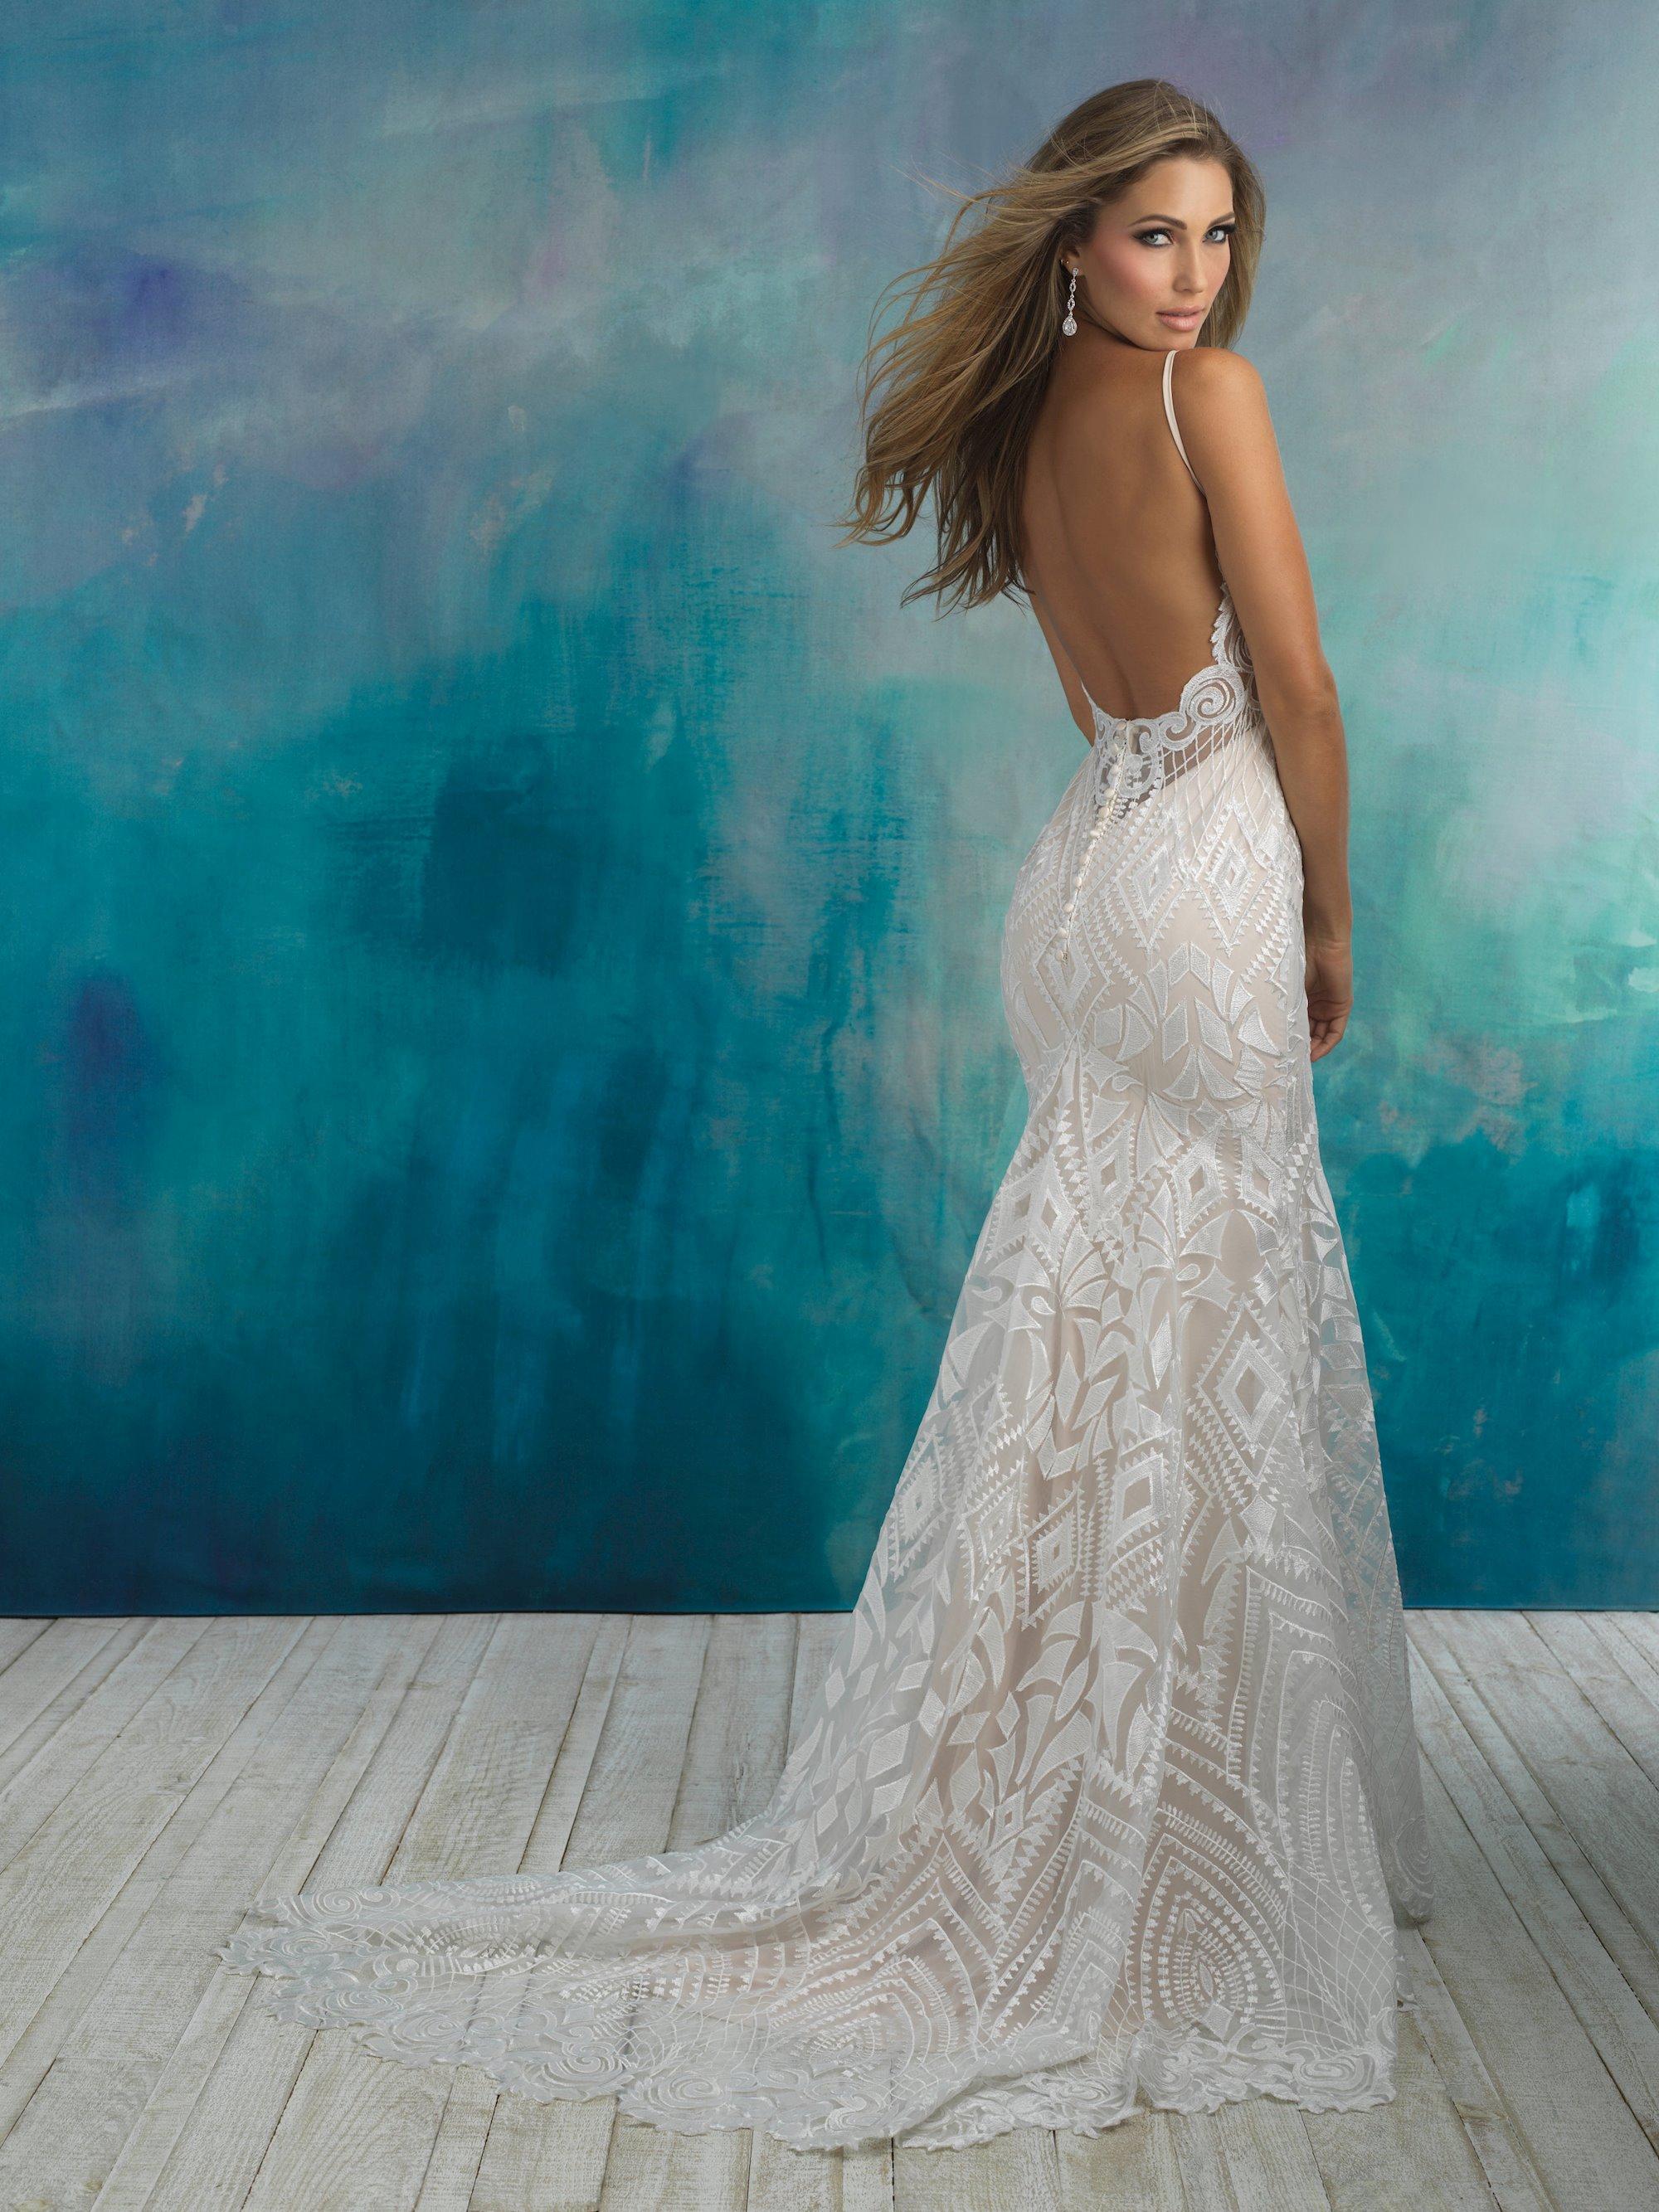 Allure Bridal 2018 Wedding Dresses | Regiss in Kentucky - 9508